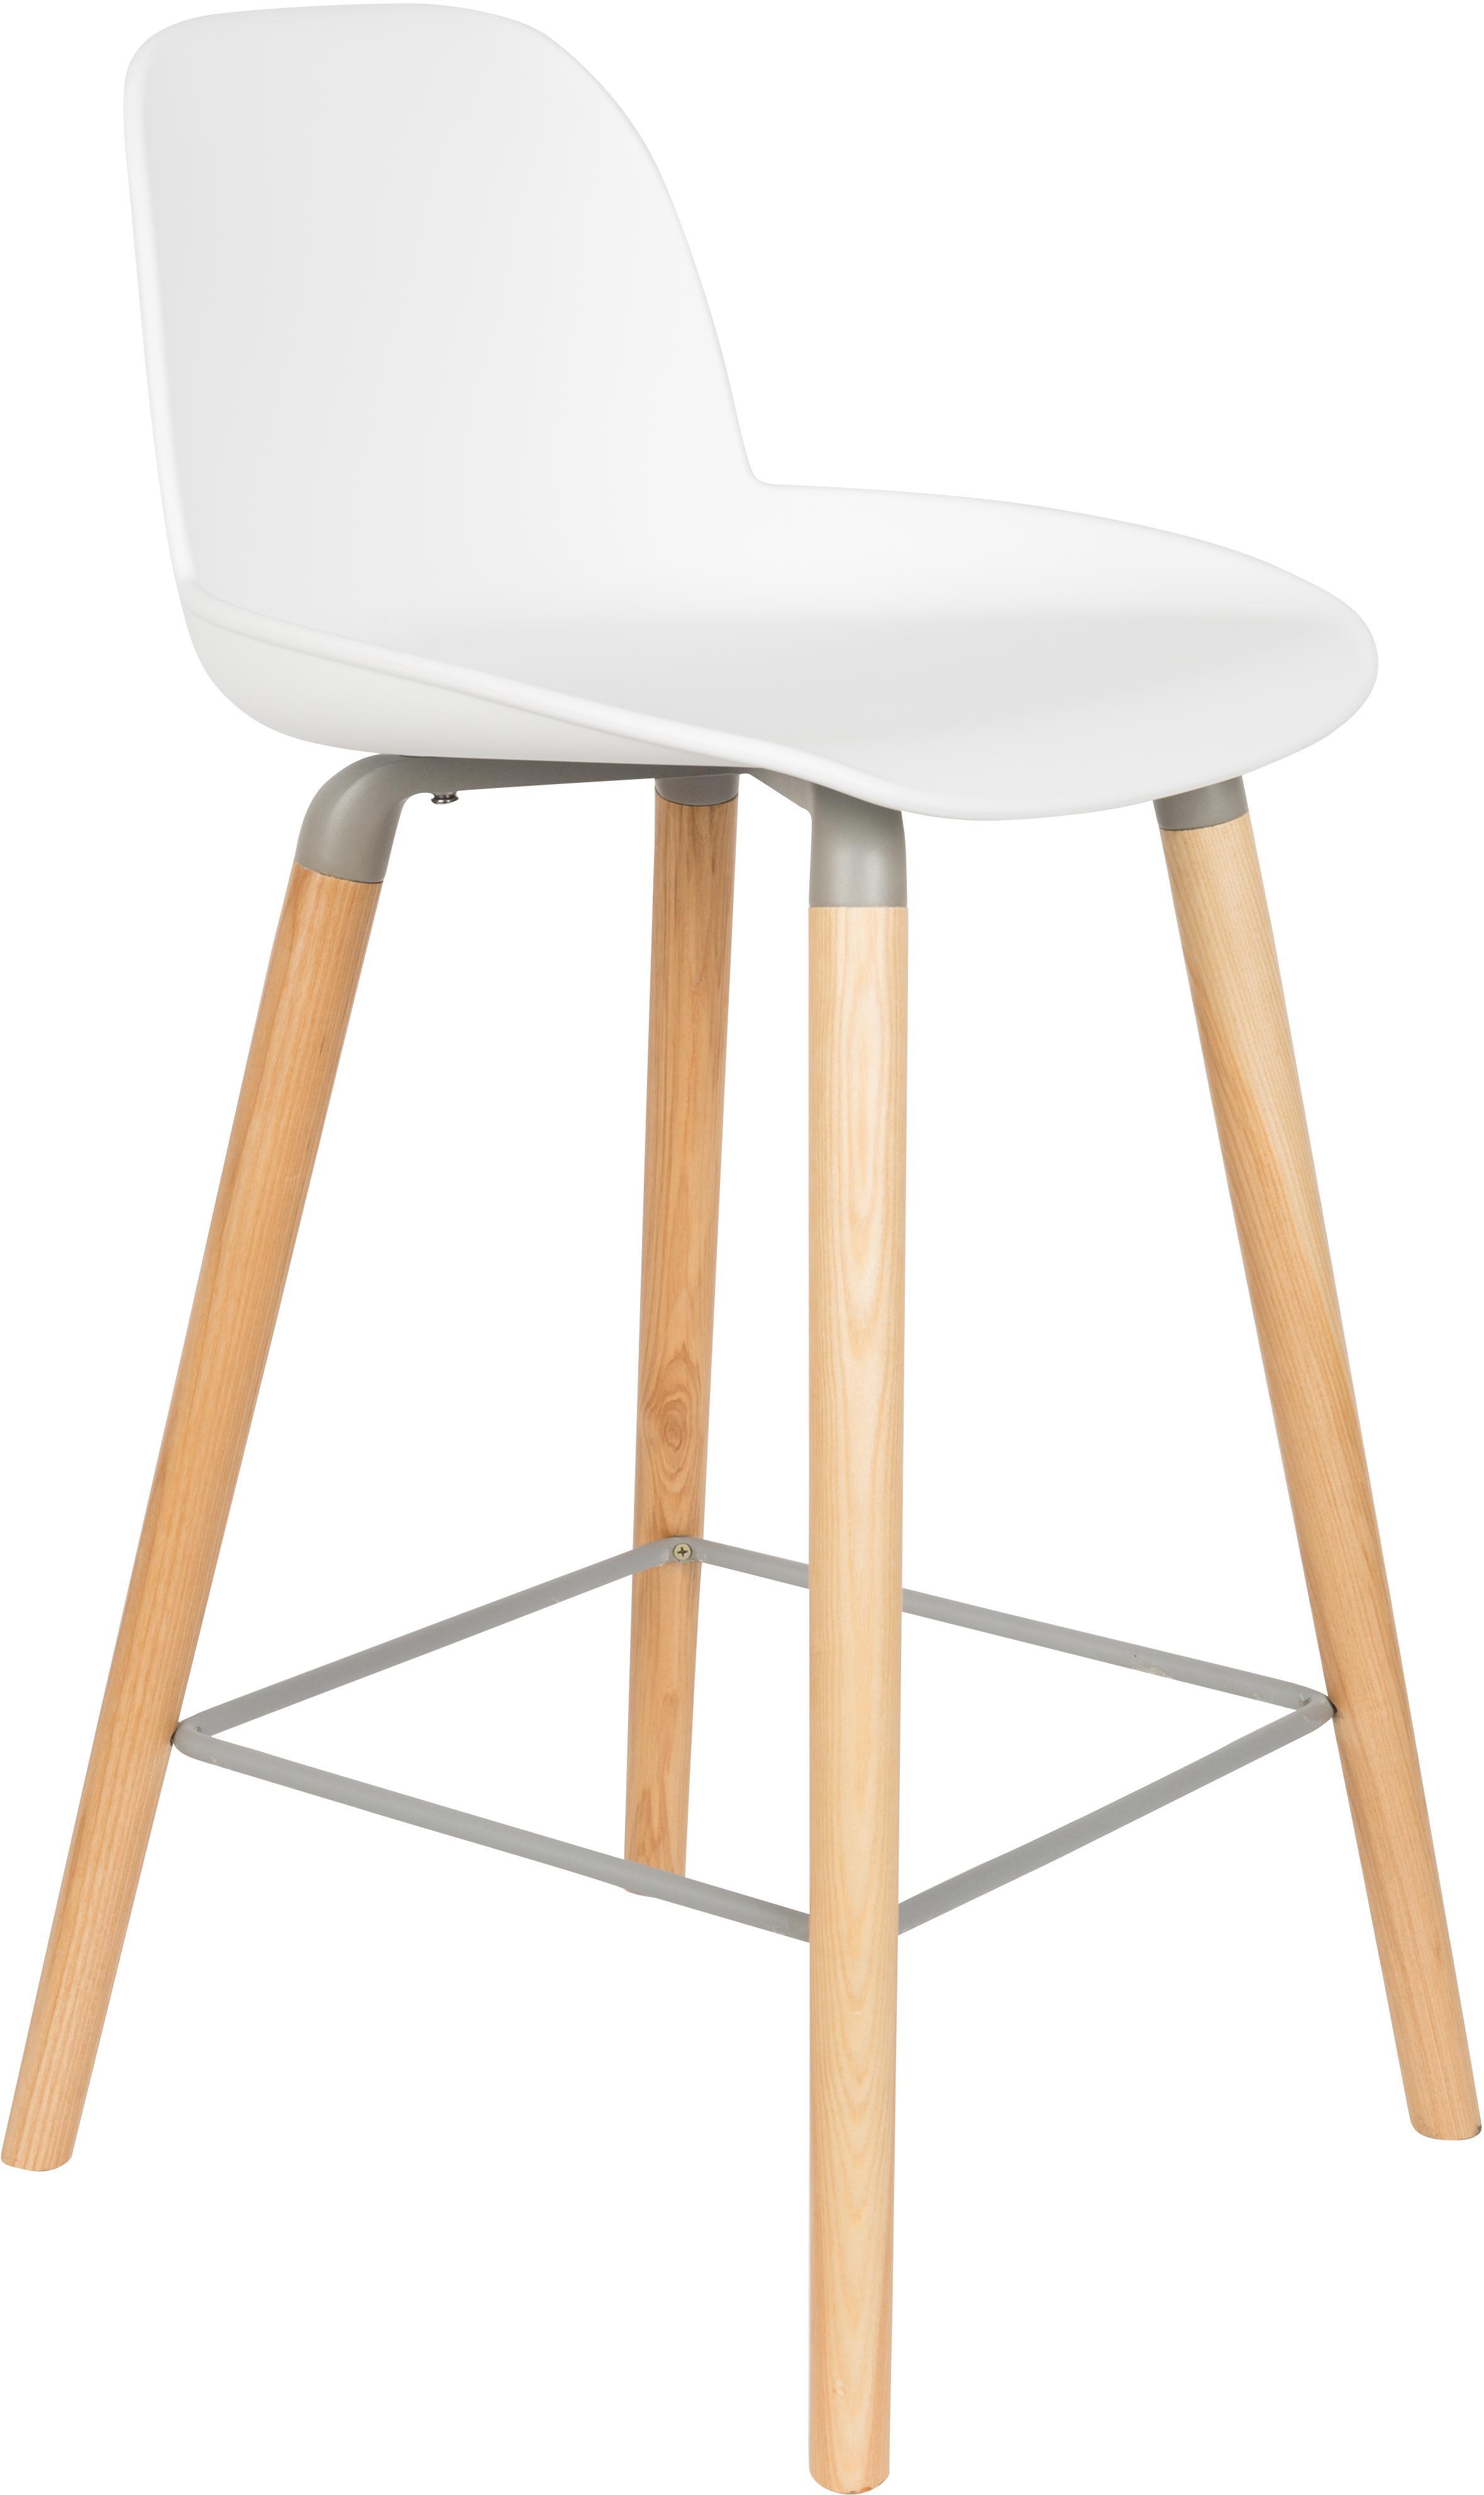 Sedia di design Albert Kuip, Seduta: polipropilene, Gambe: legno di frassino, Struttura: alluminio, Seduta: bianco  Gambe: legno di frassino Cornice e Poggiapiedi: grigio, Larg. 45 x Alt. 89 cm